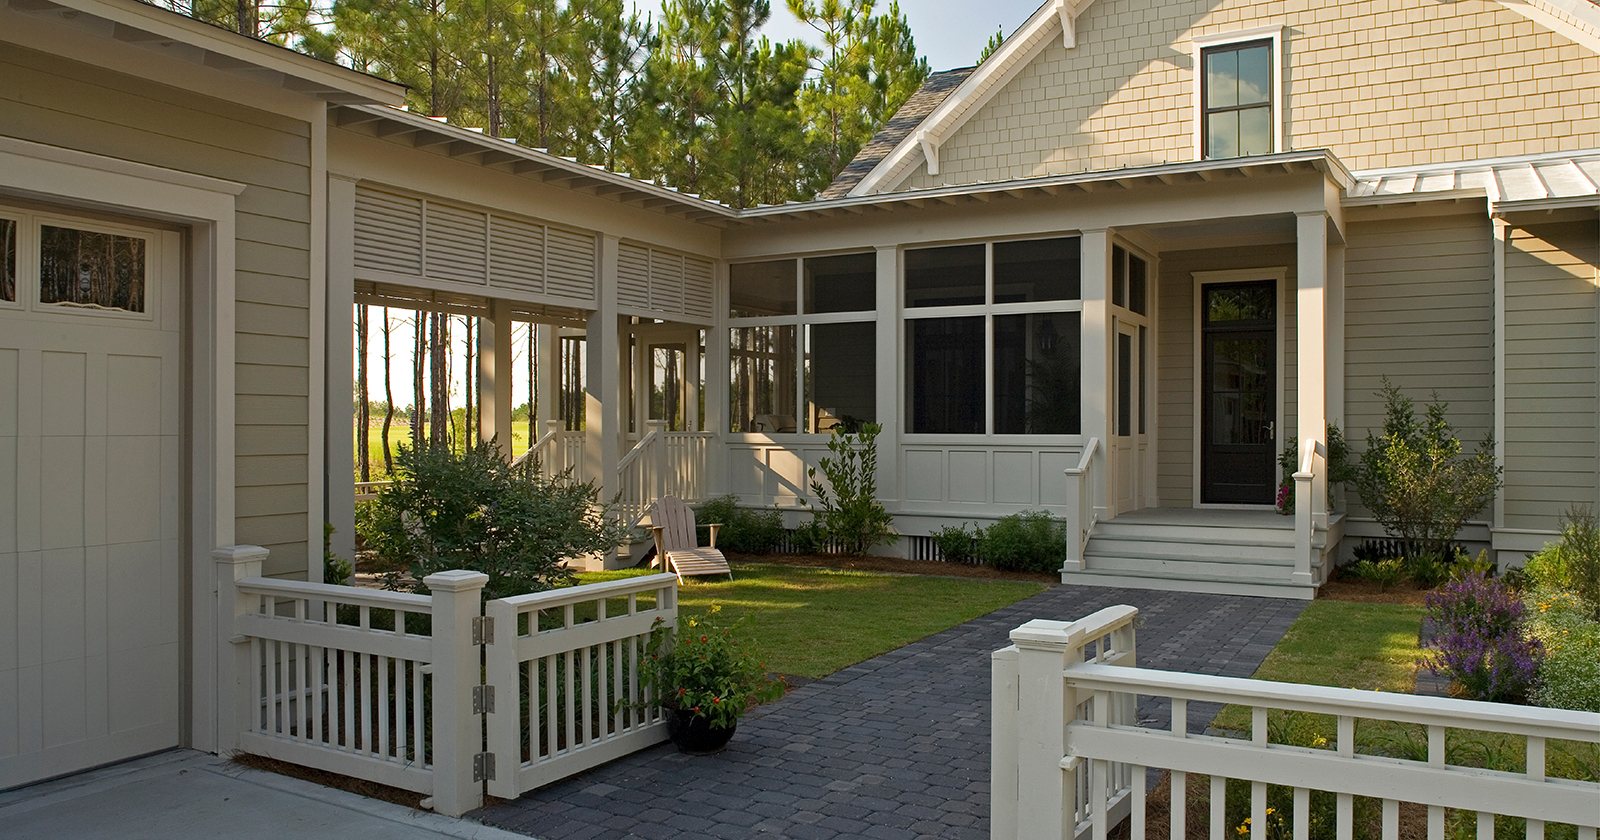 Southern Living Idea House, Tucker Bayou, WaterSound, Santa Rosa Beach, FL